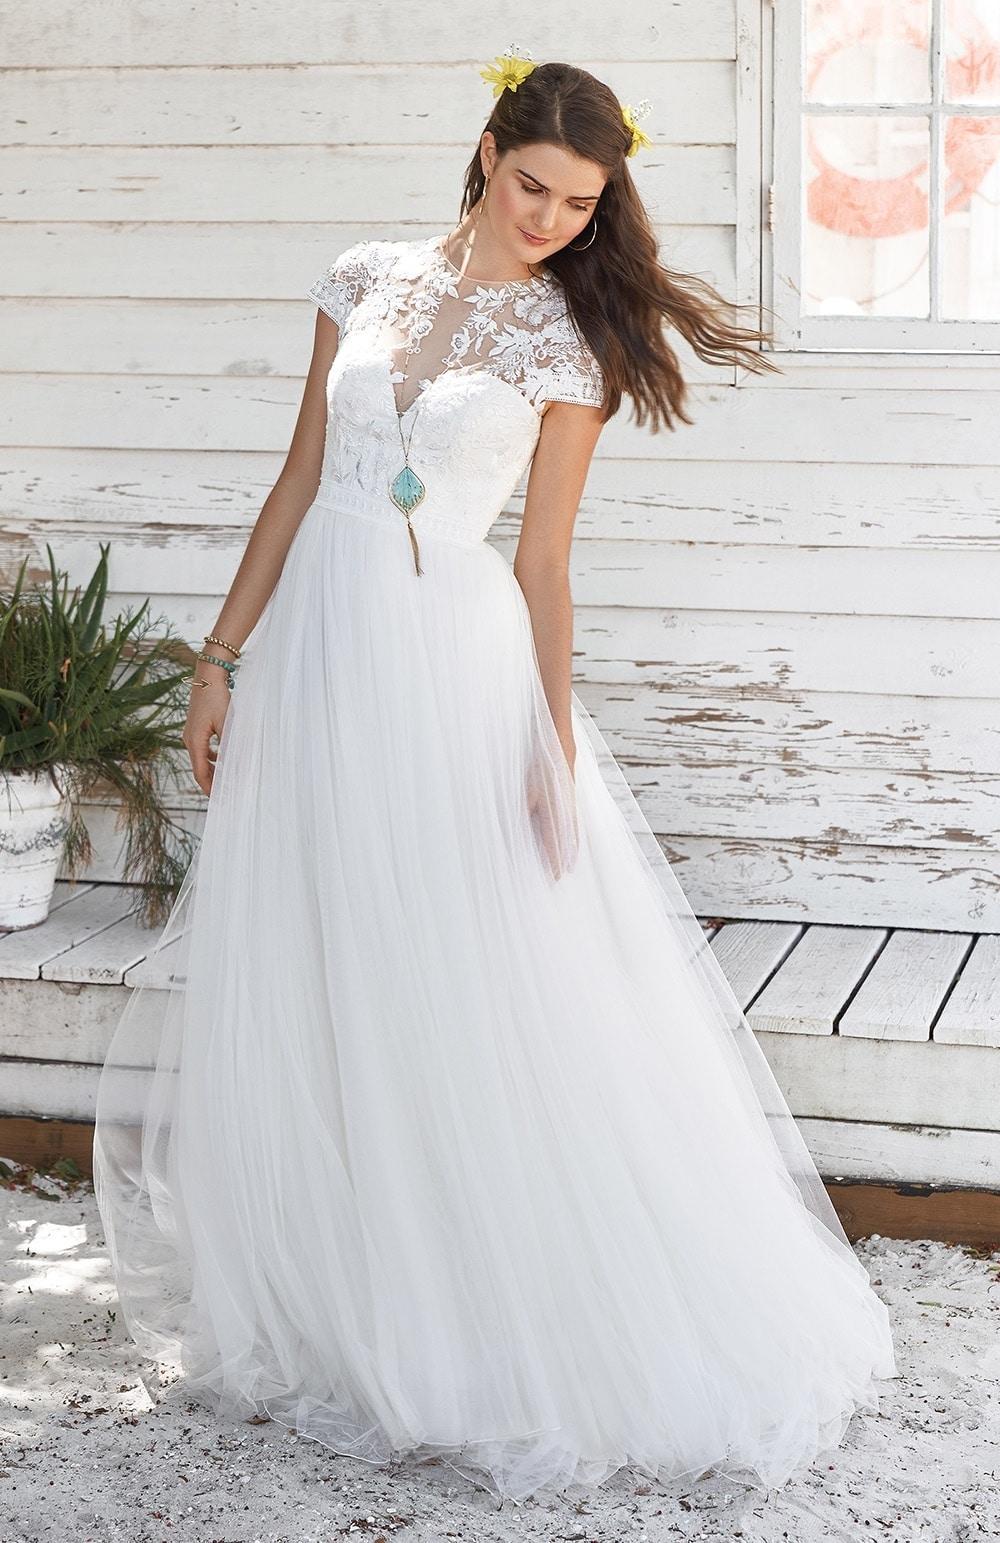 Robe de mariée Modèle Nicia – 66038